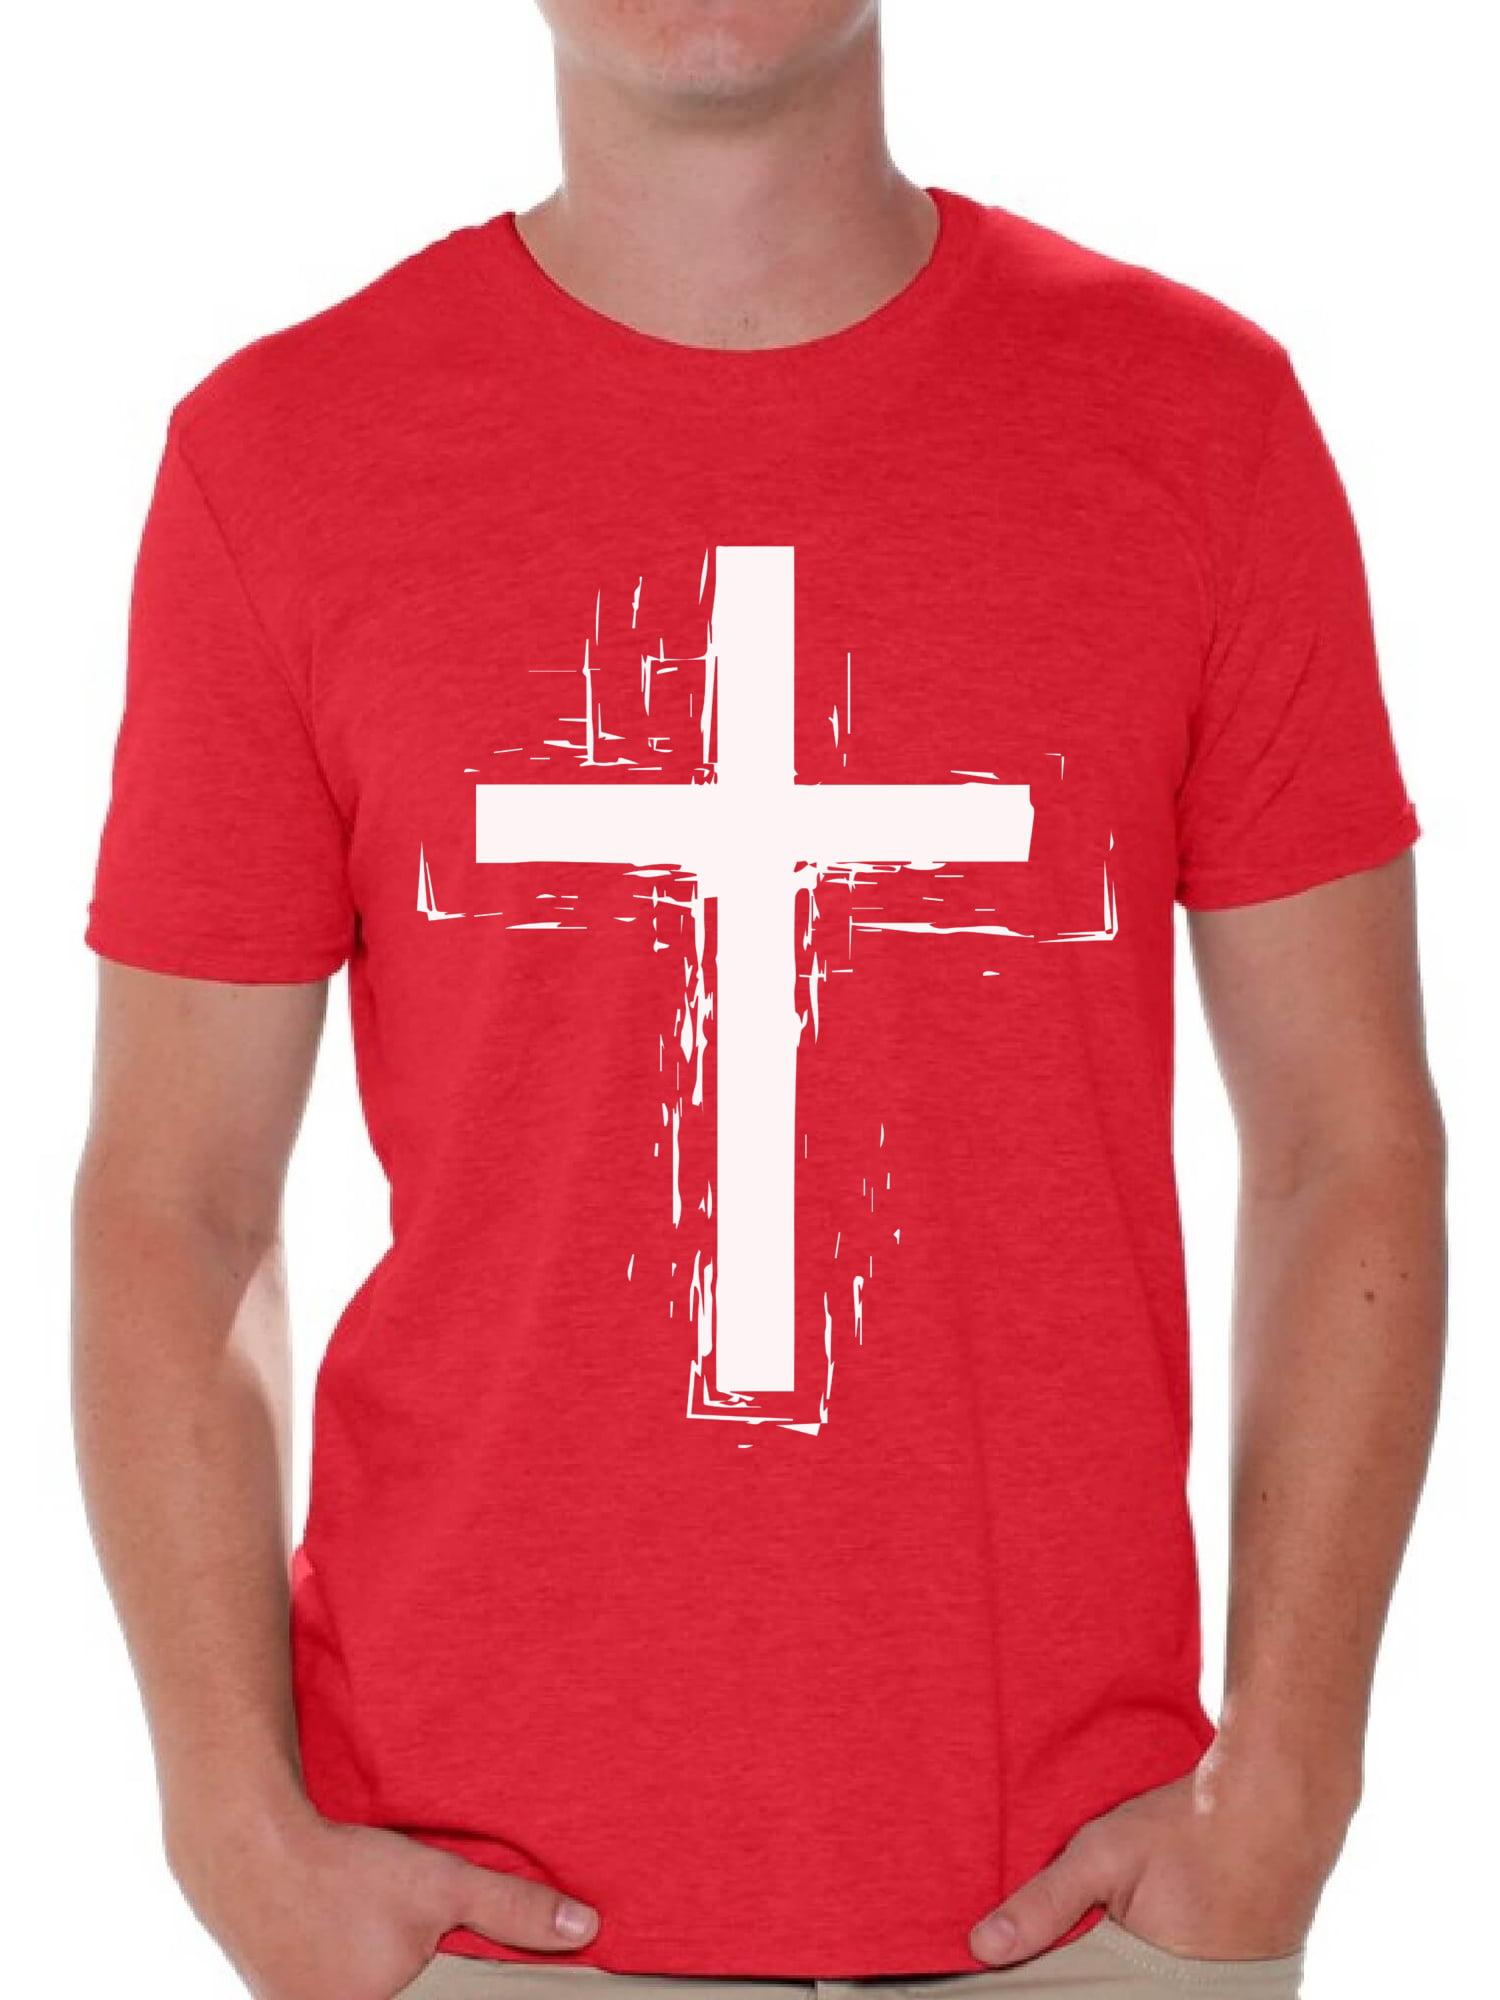 At The Cross T-Shirt